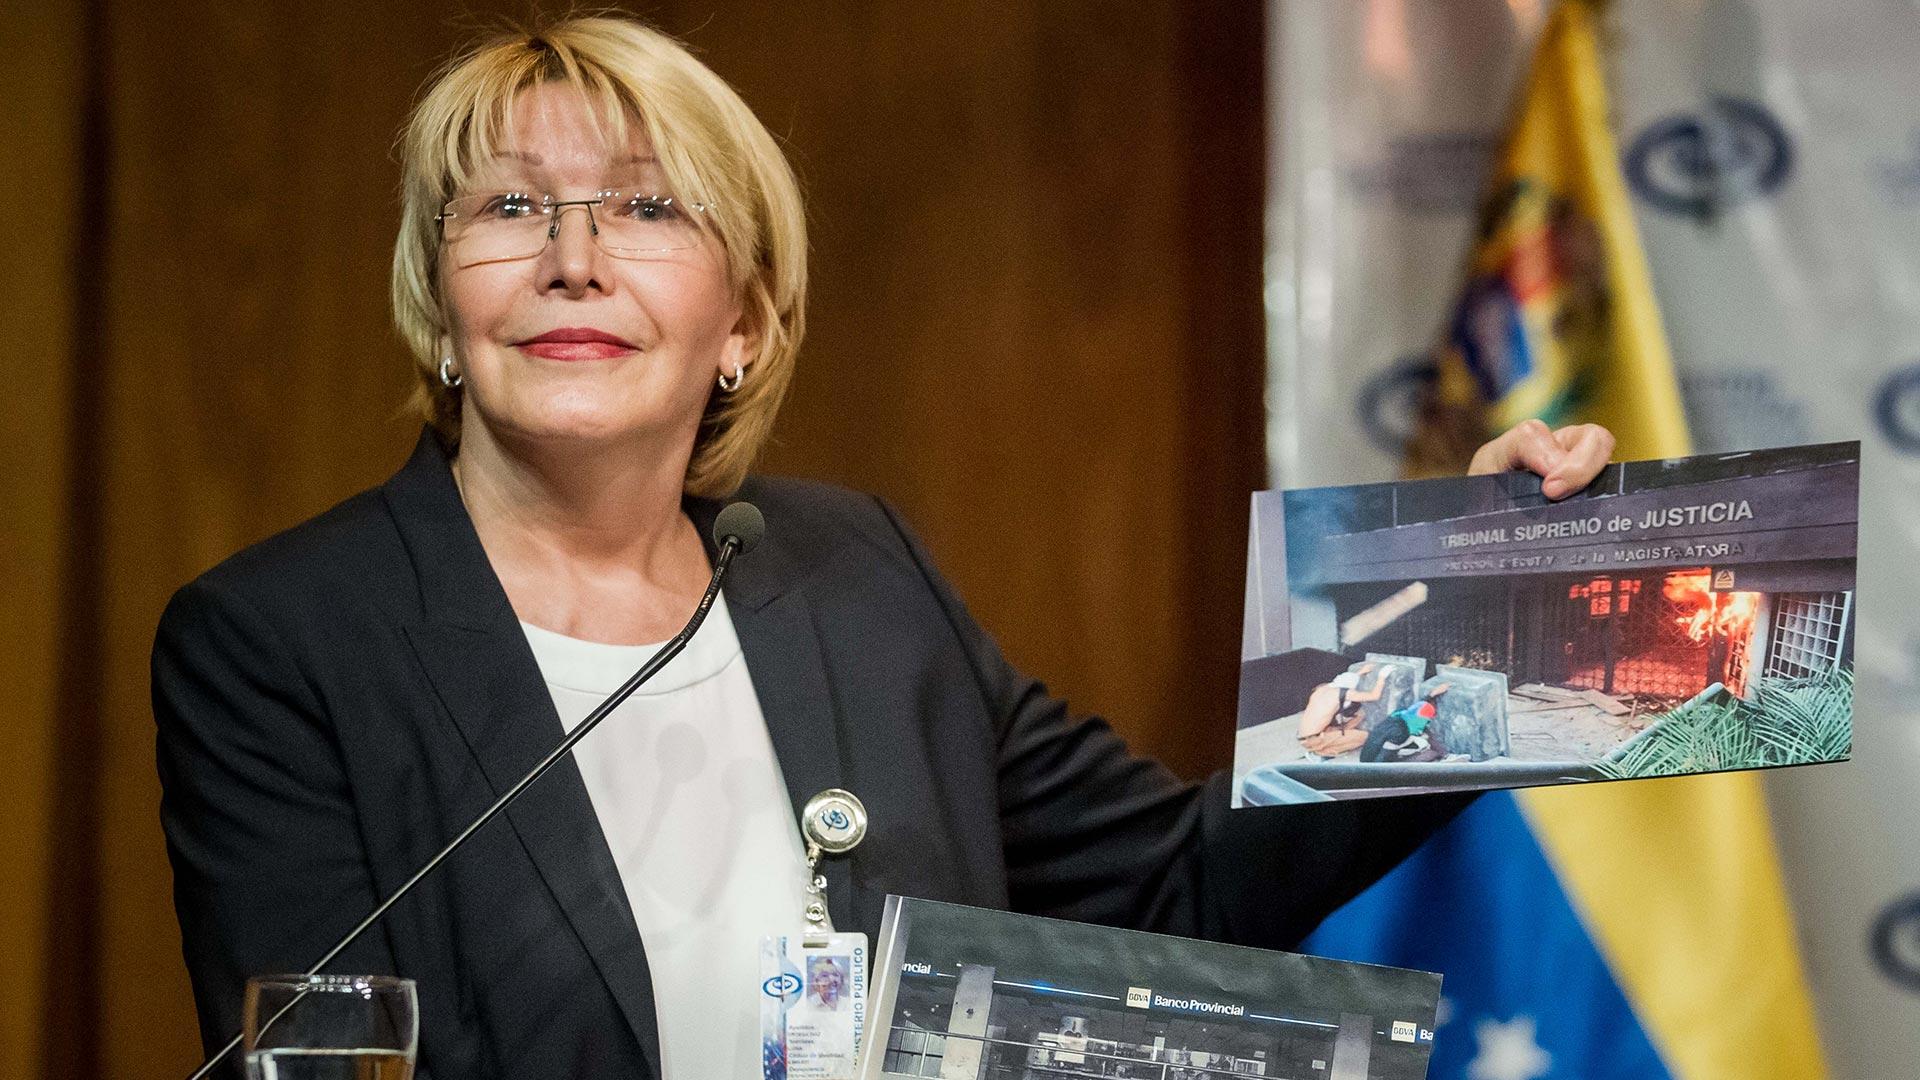 Luisa Ortega Diaz fue destituida por la Asamblea Constituyente chavista (EFE)